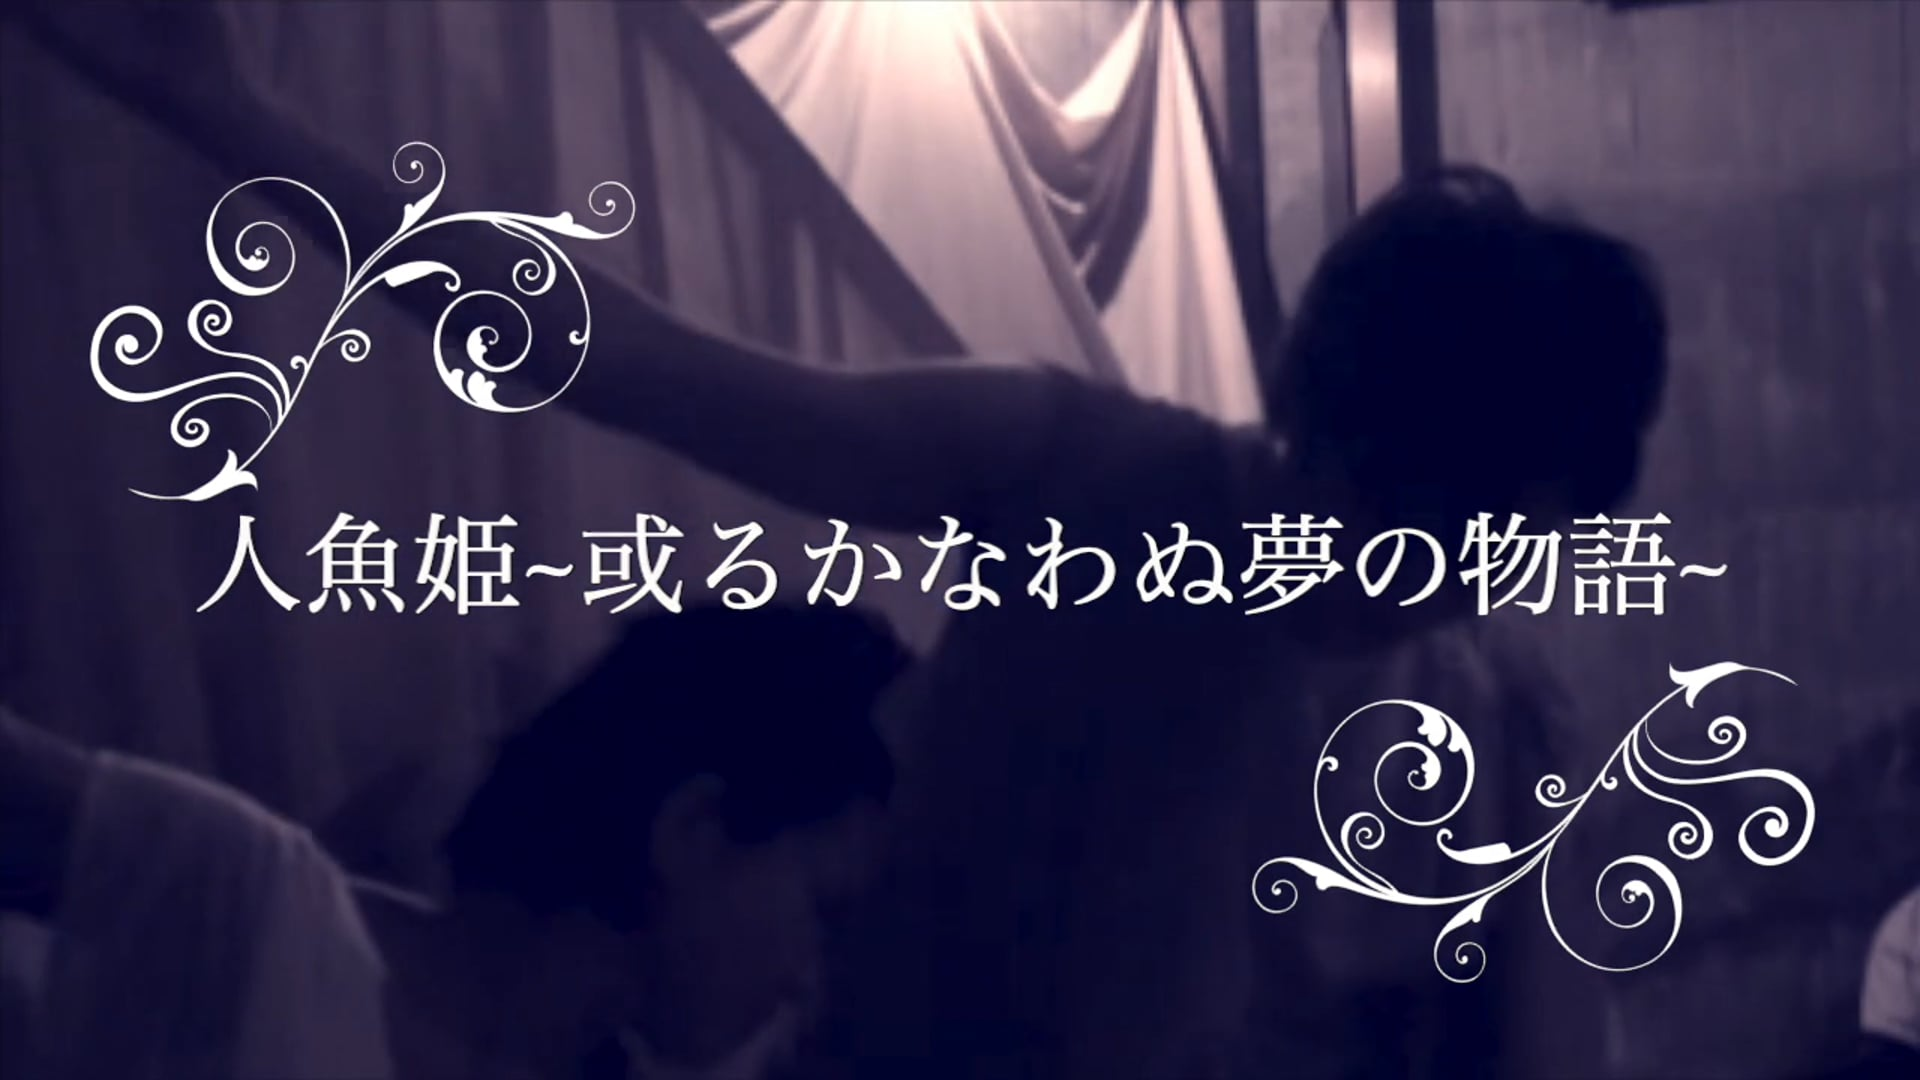 MUSICAI「人魚姫~或るかなわぬ夢の物語~」trailer